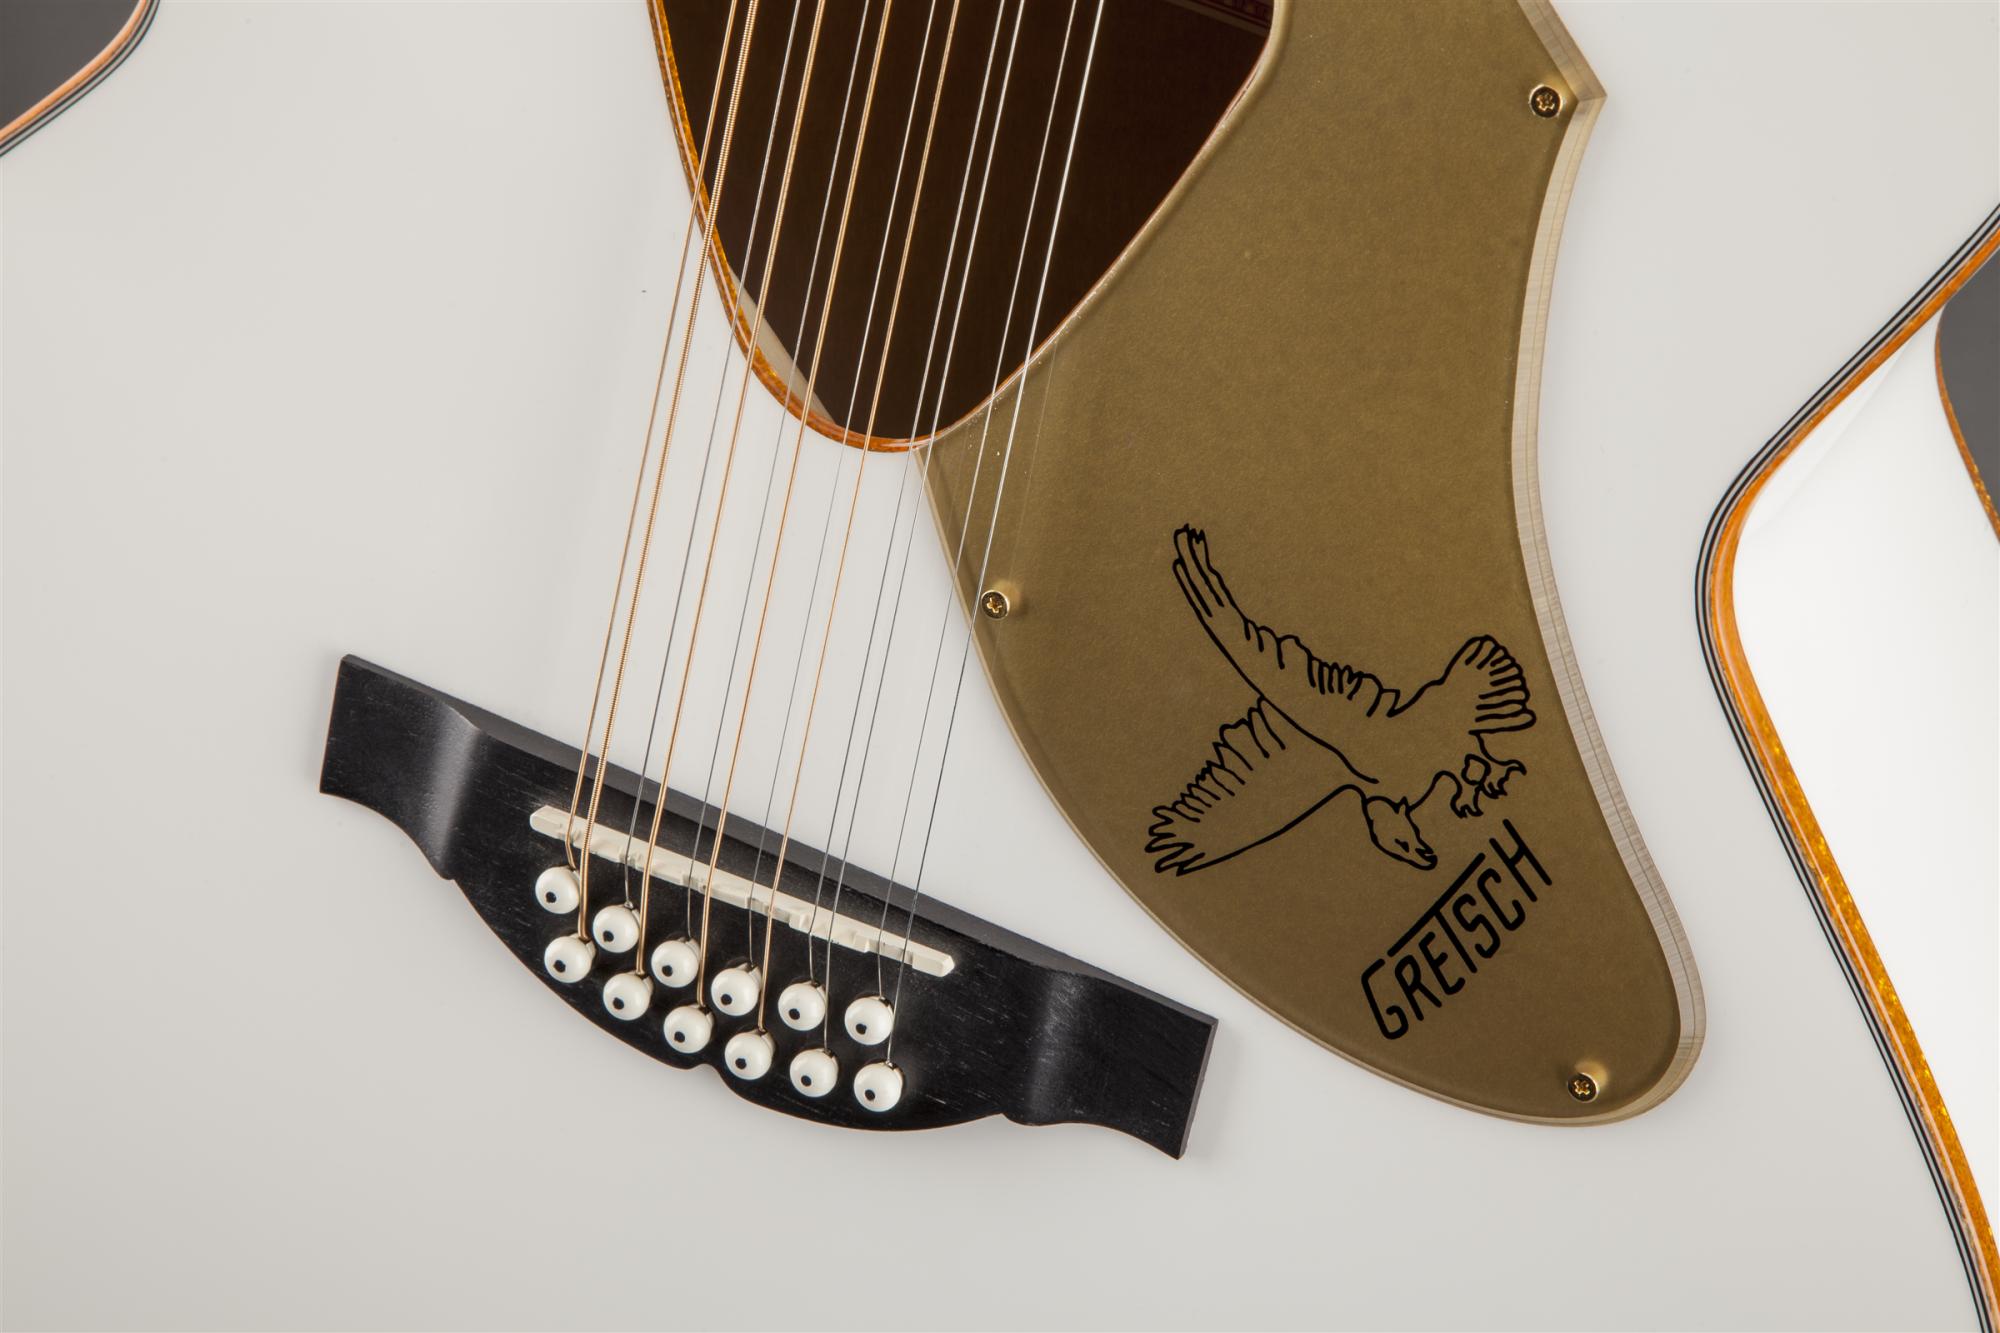 Gretsch G5022CWFE-12 Rancher Falcon Jumbo - White